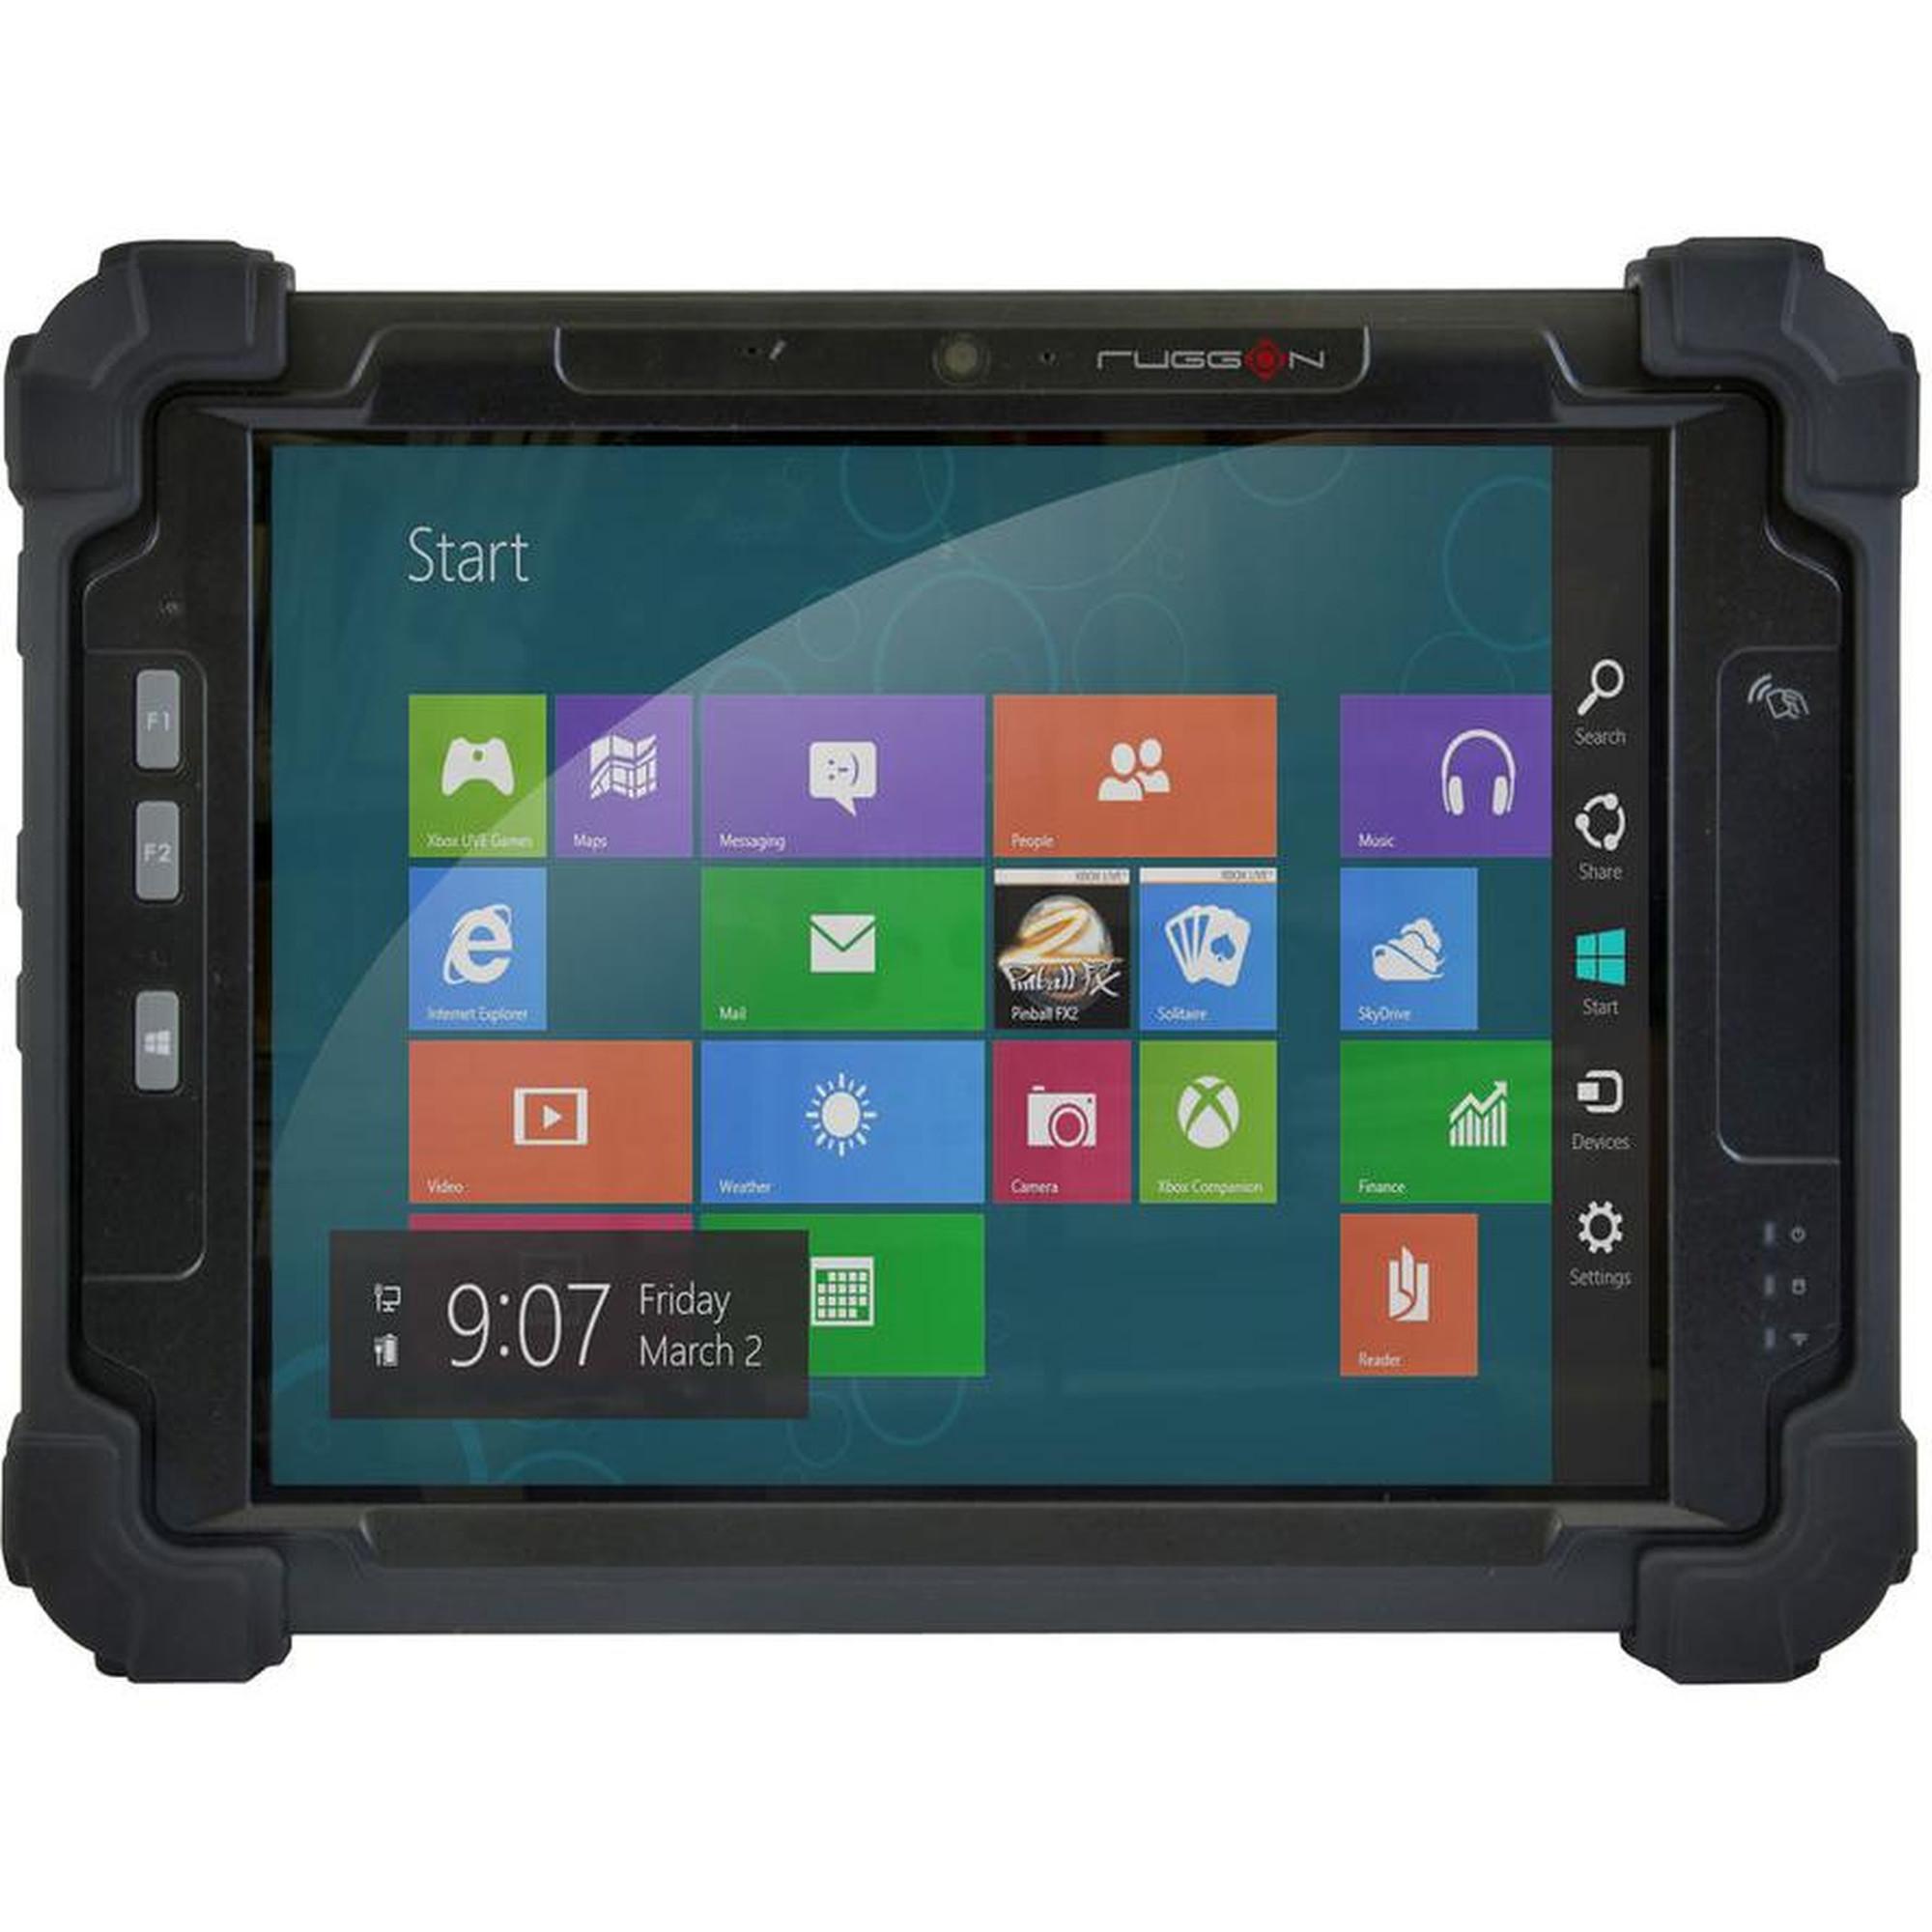 "RuggON Industrie-Tablet RUGGED PM522 10.4"" E3827/4GB/64GB W10IoT - 64 GB - 26,4 cm"